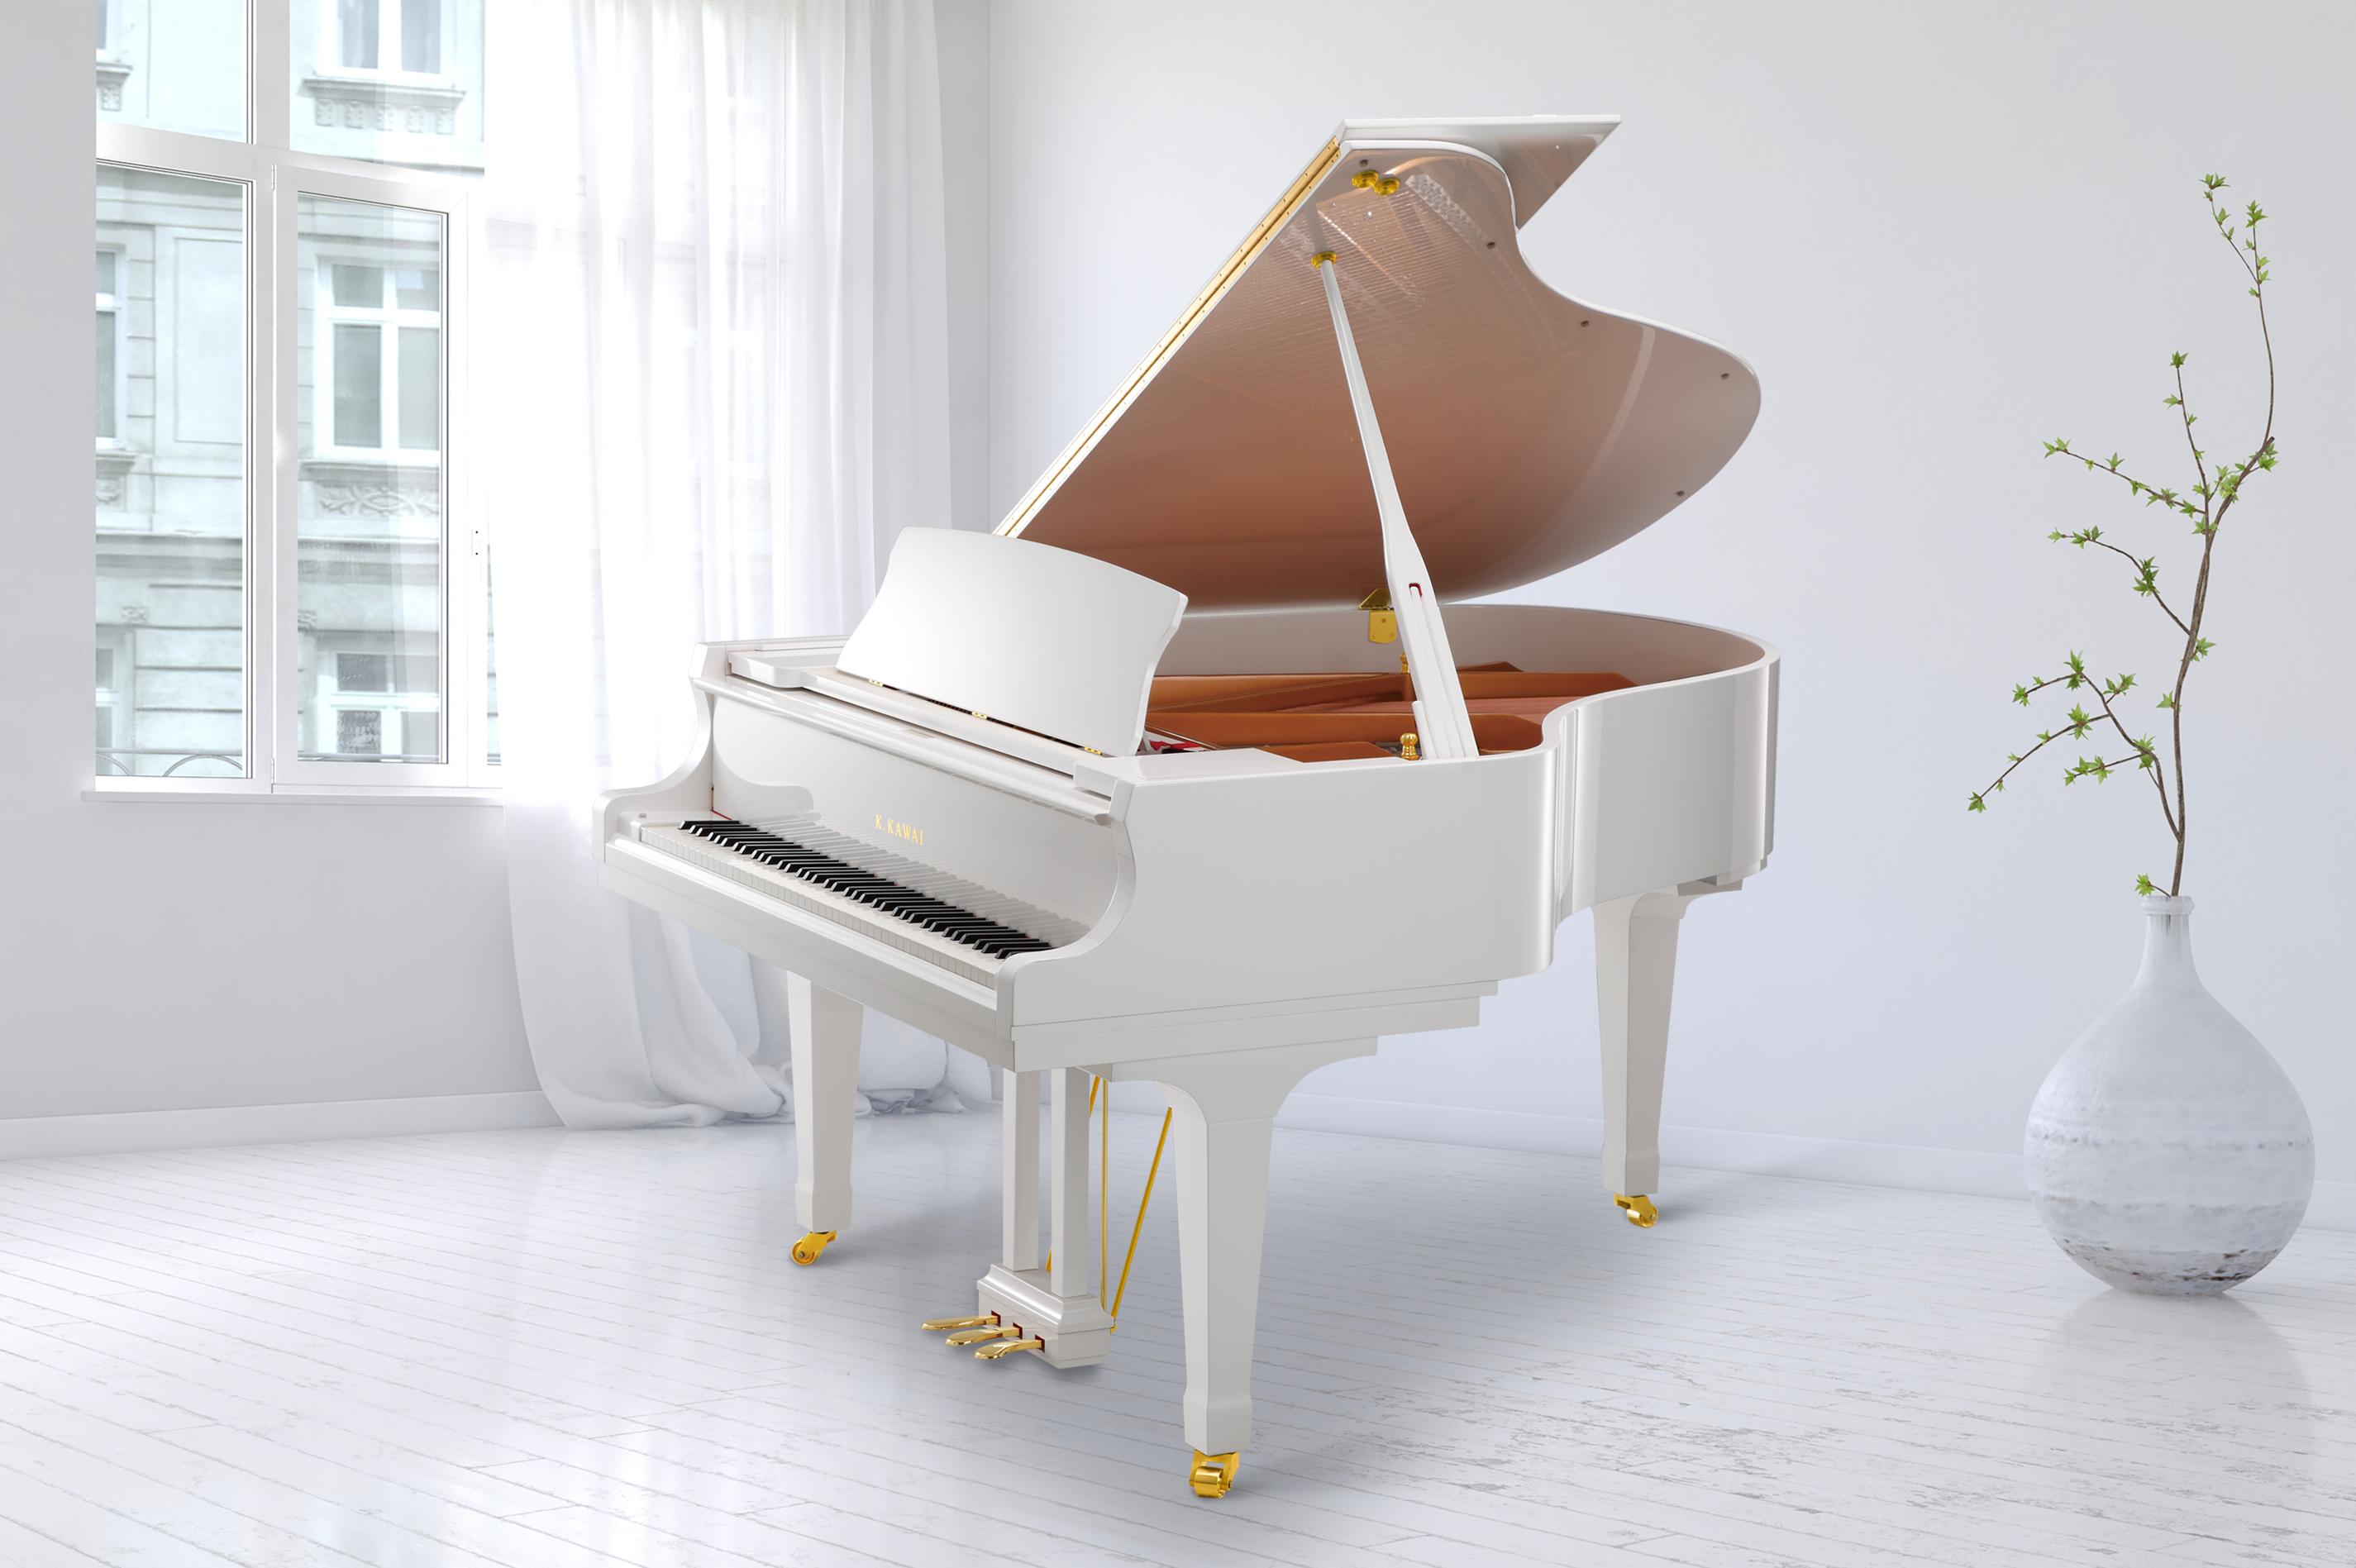 Kawai gx-2 Grand Piano White